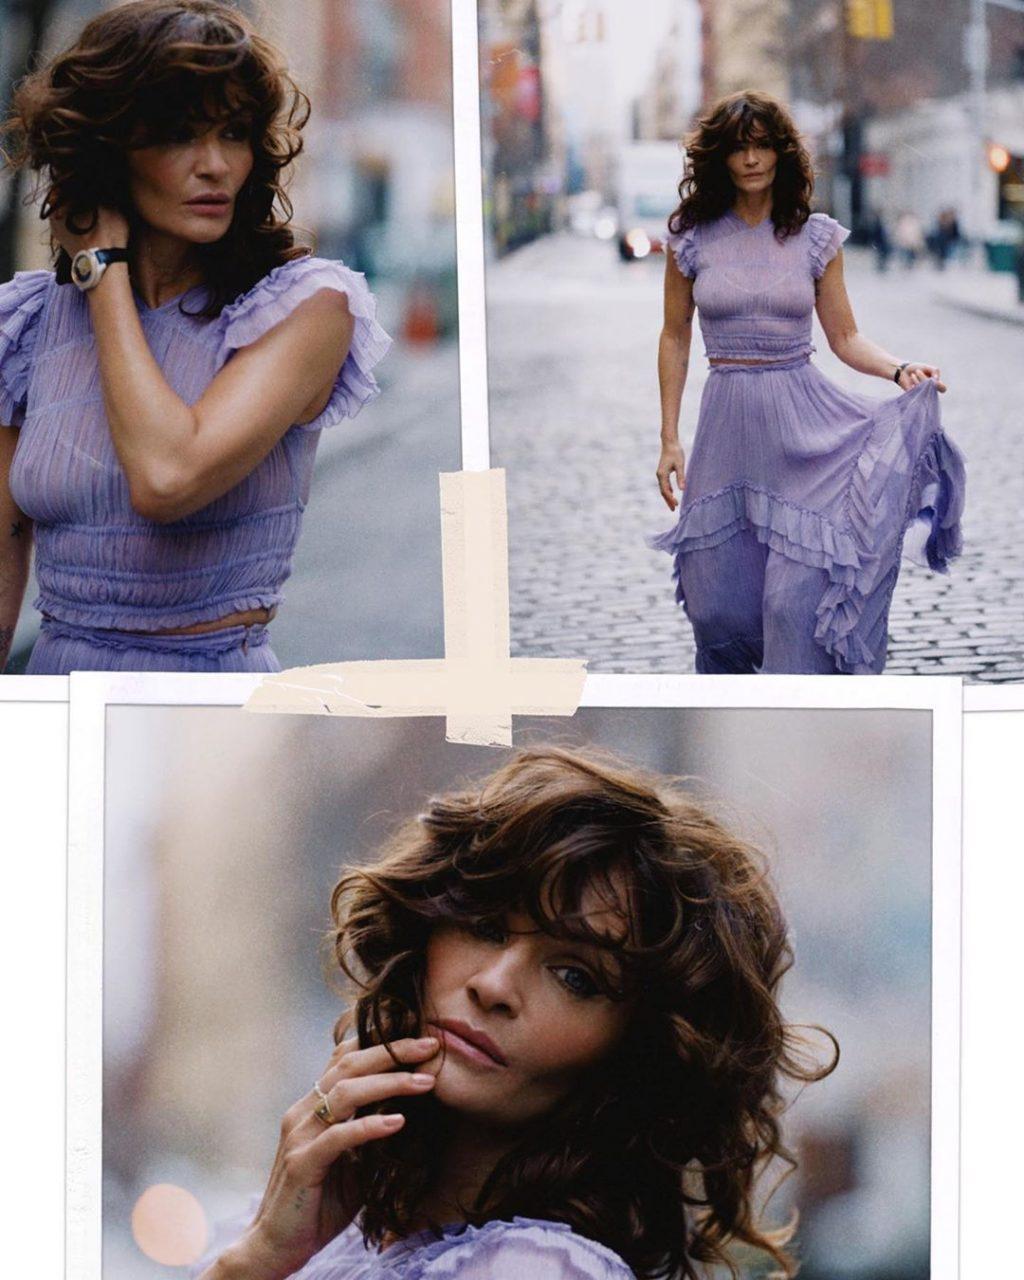 Helena Christensen Flaunts Her Tits (12 Photos)